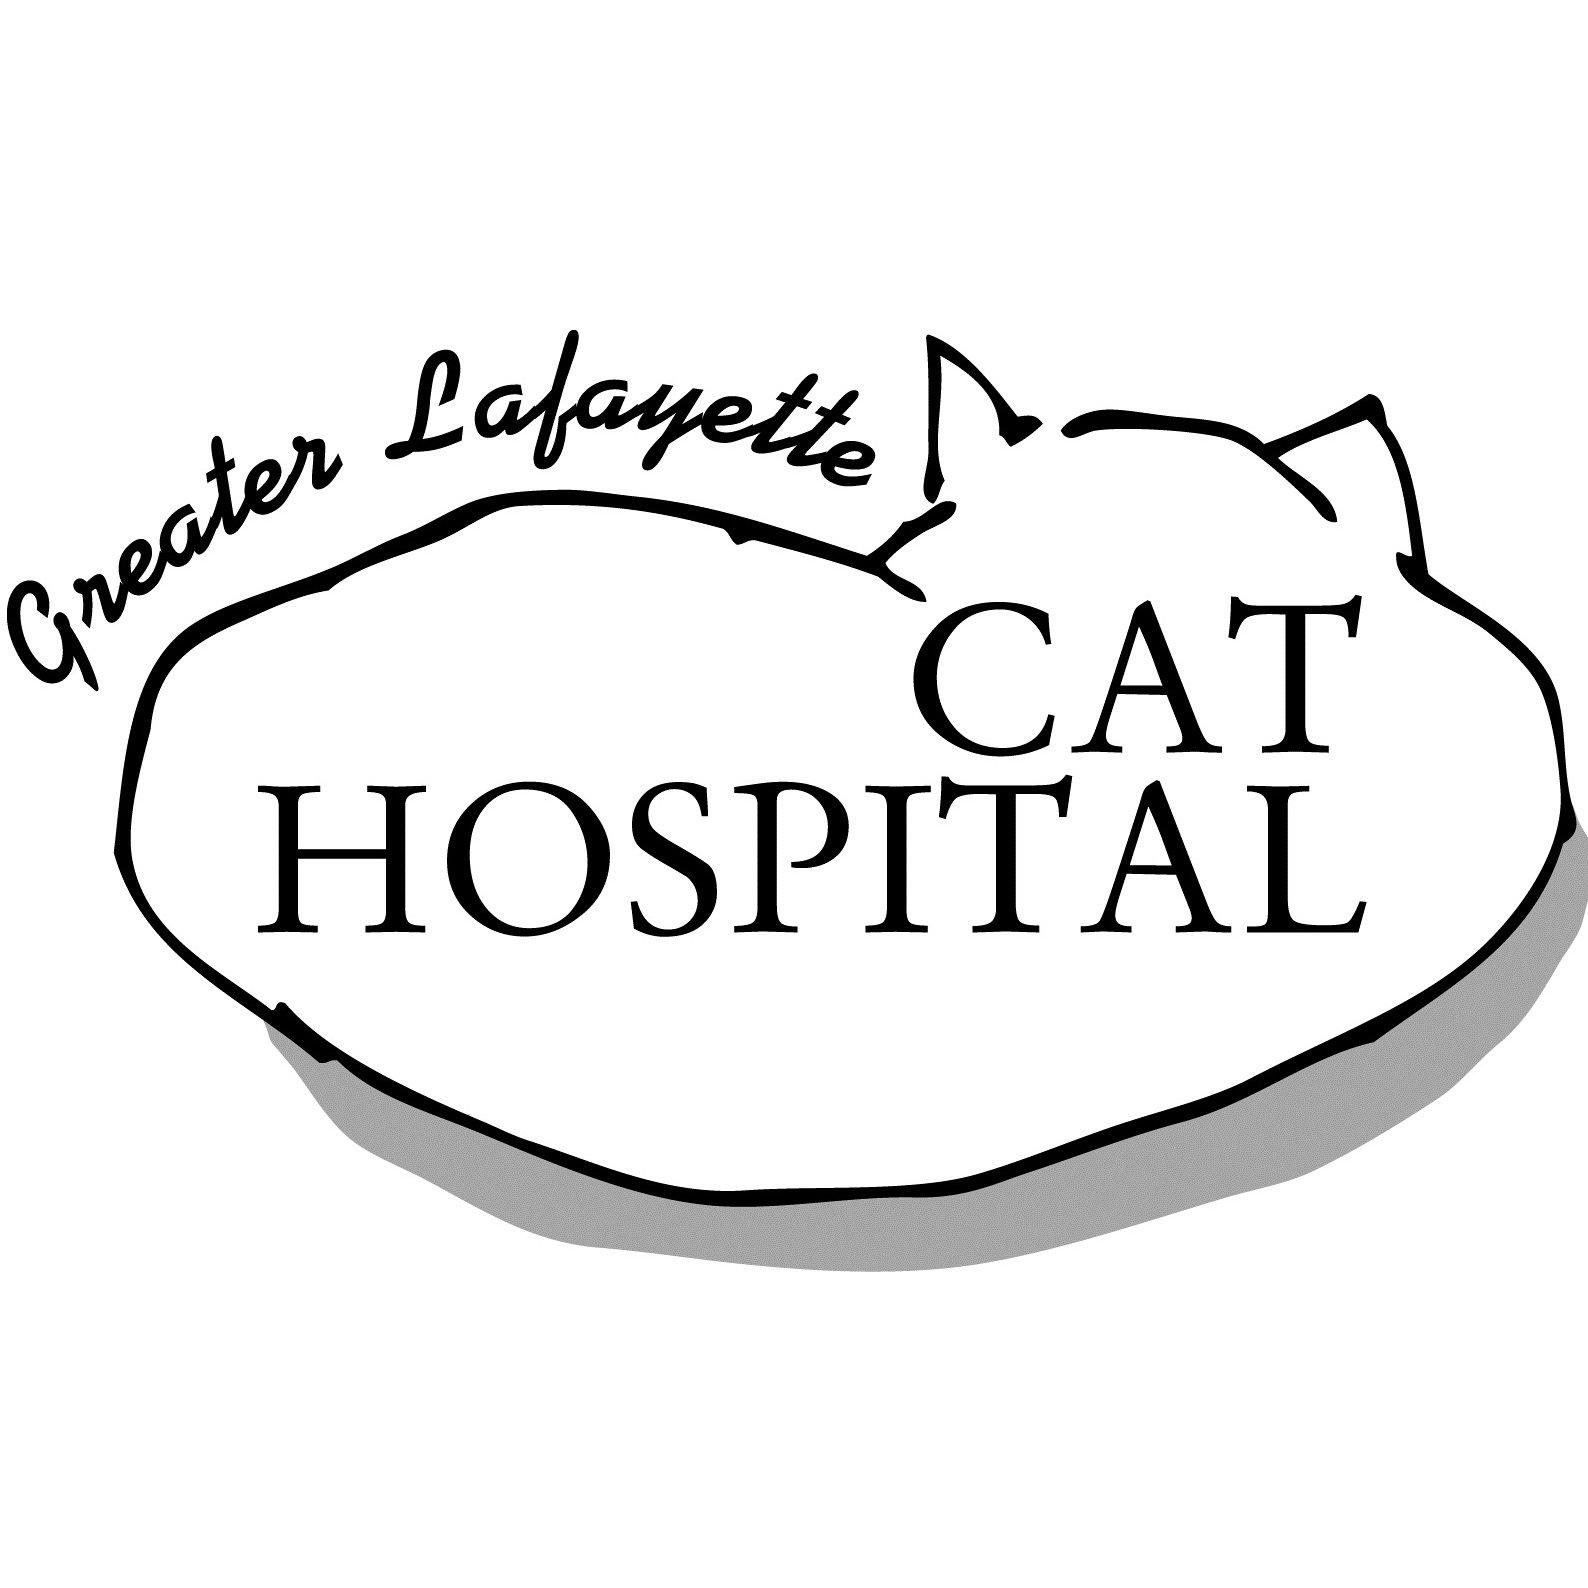 Greater Lafayette Cat Hospital